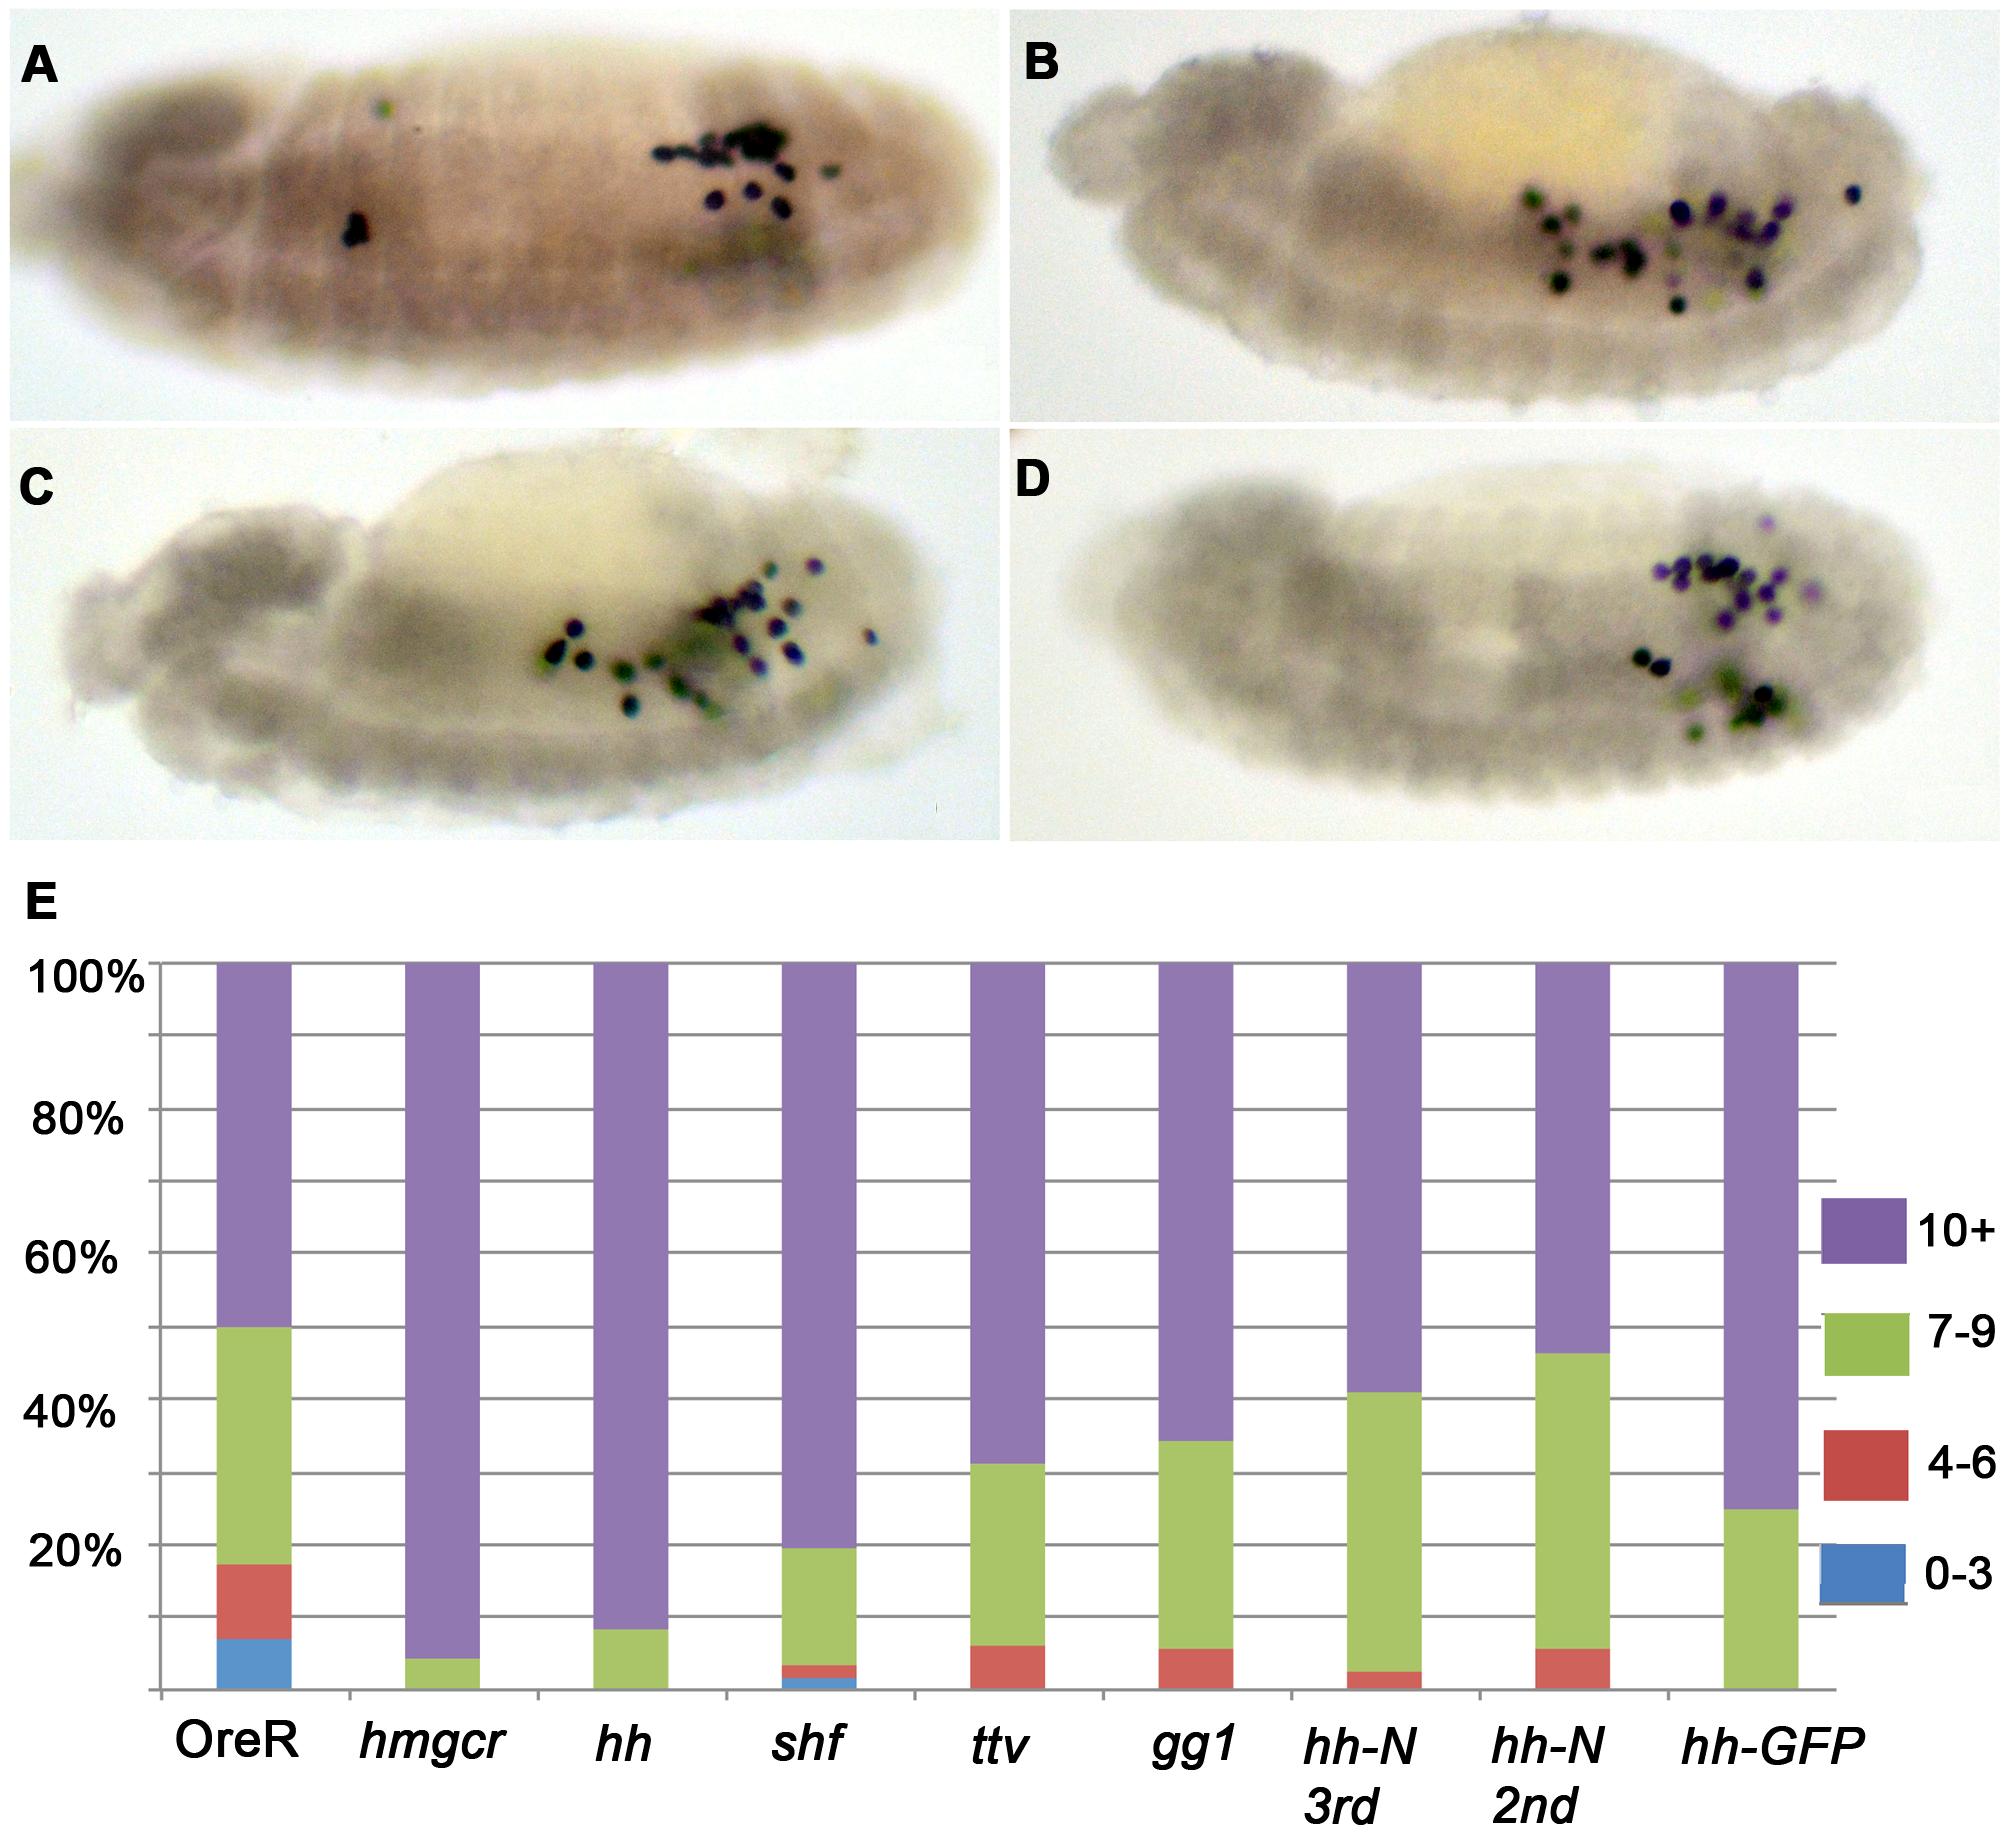 Enhancement of the <i>elav</i>-<i>GAL4 UAS</i>-<i>hmgcr</i> PGC migration defects by co-expression of <i>hh</i> pathway genes.